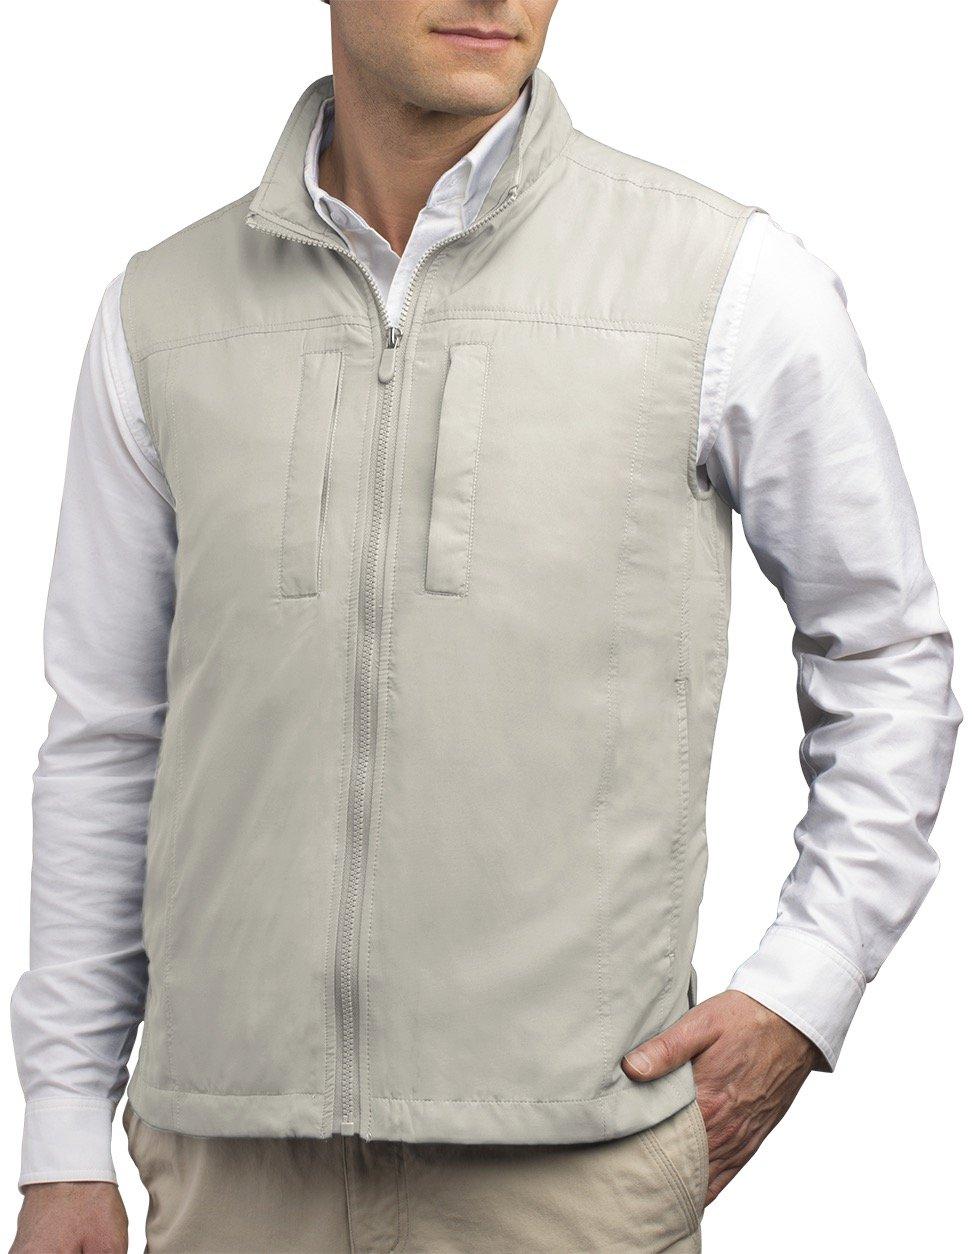 SCOTTeVEST Men's Featherweight Vest - 14 Pockets - Travel Clothing CMT L by SCOTTeVEST (Image #1)